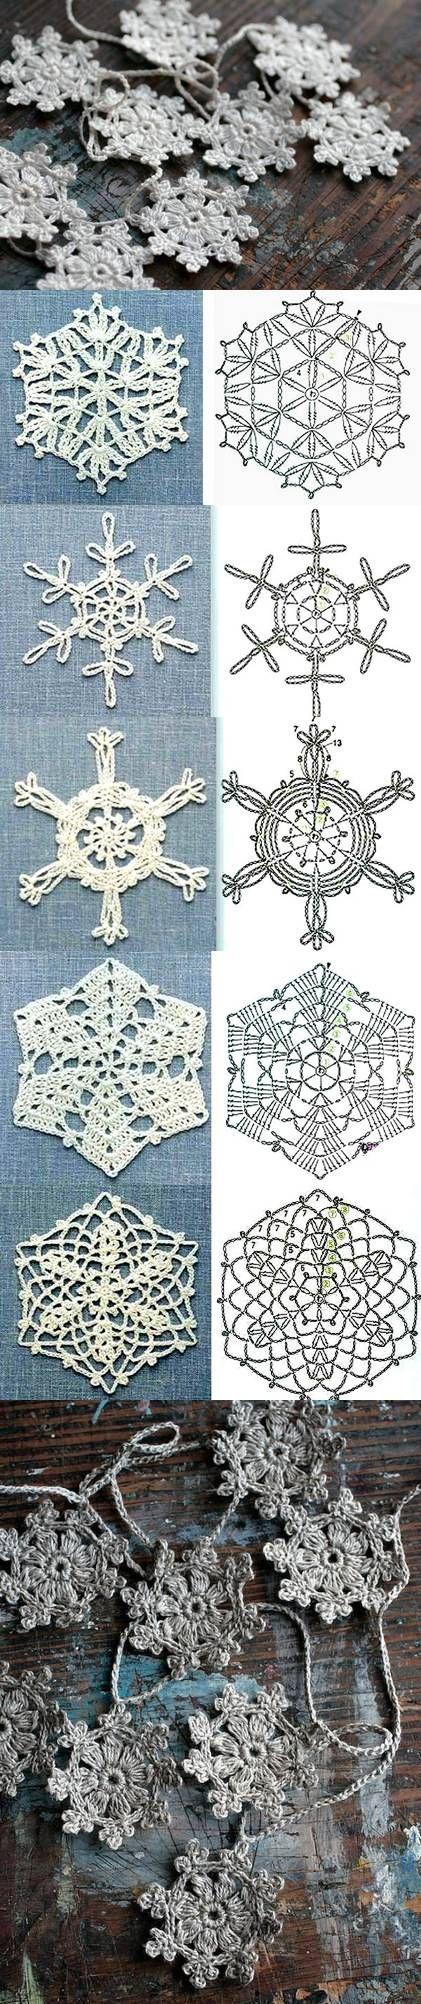 DIY Schemes Crochet Snowflakes DIY Projects